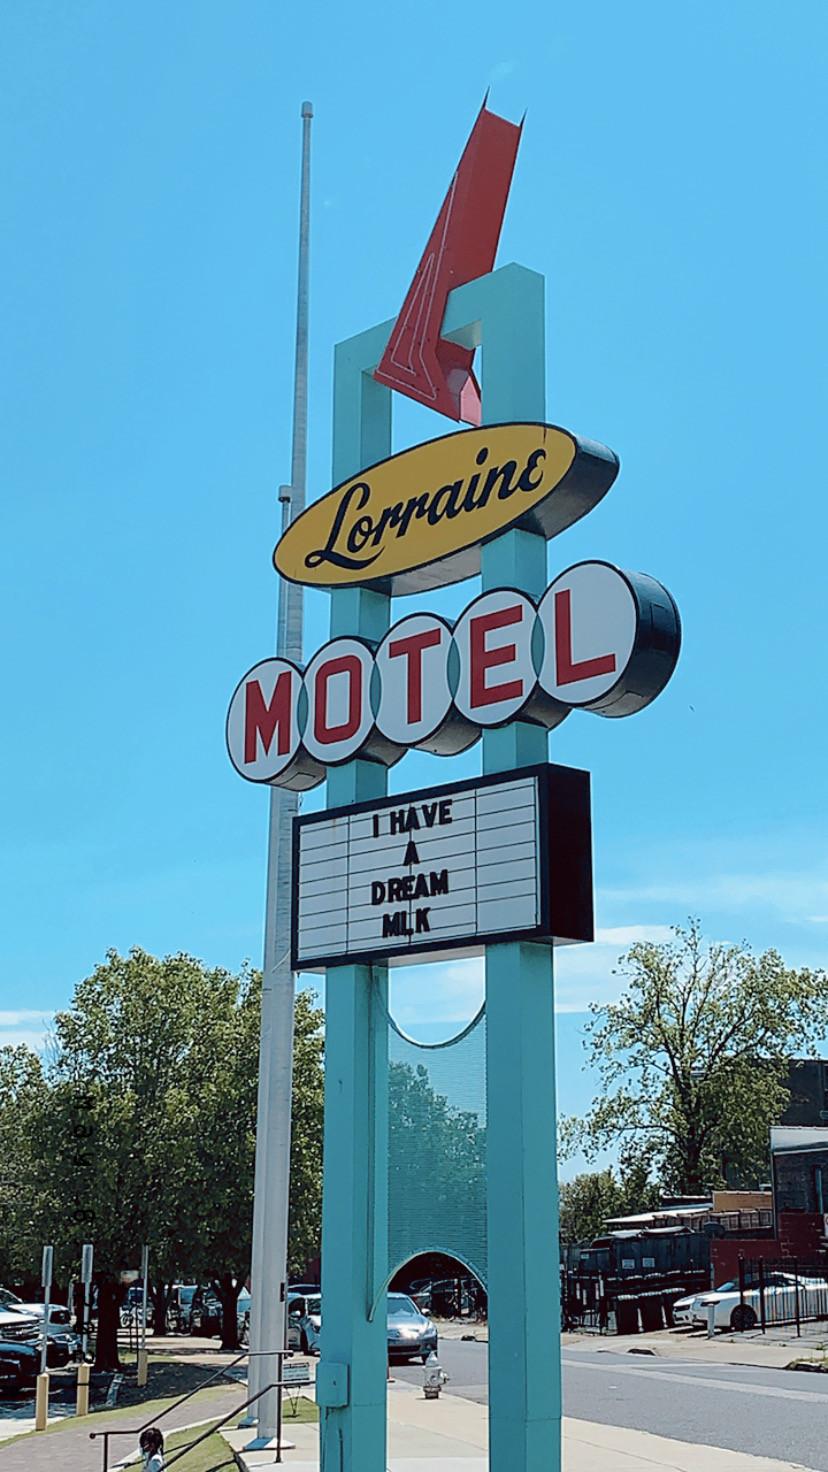 The Lorraine Motel, Memphis Tennessee